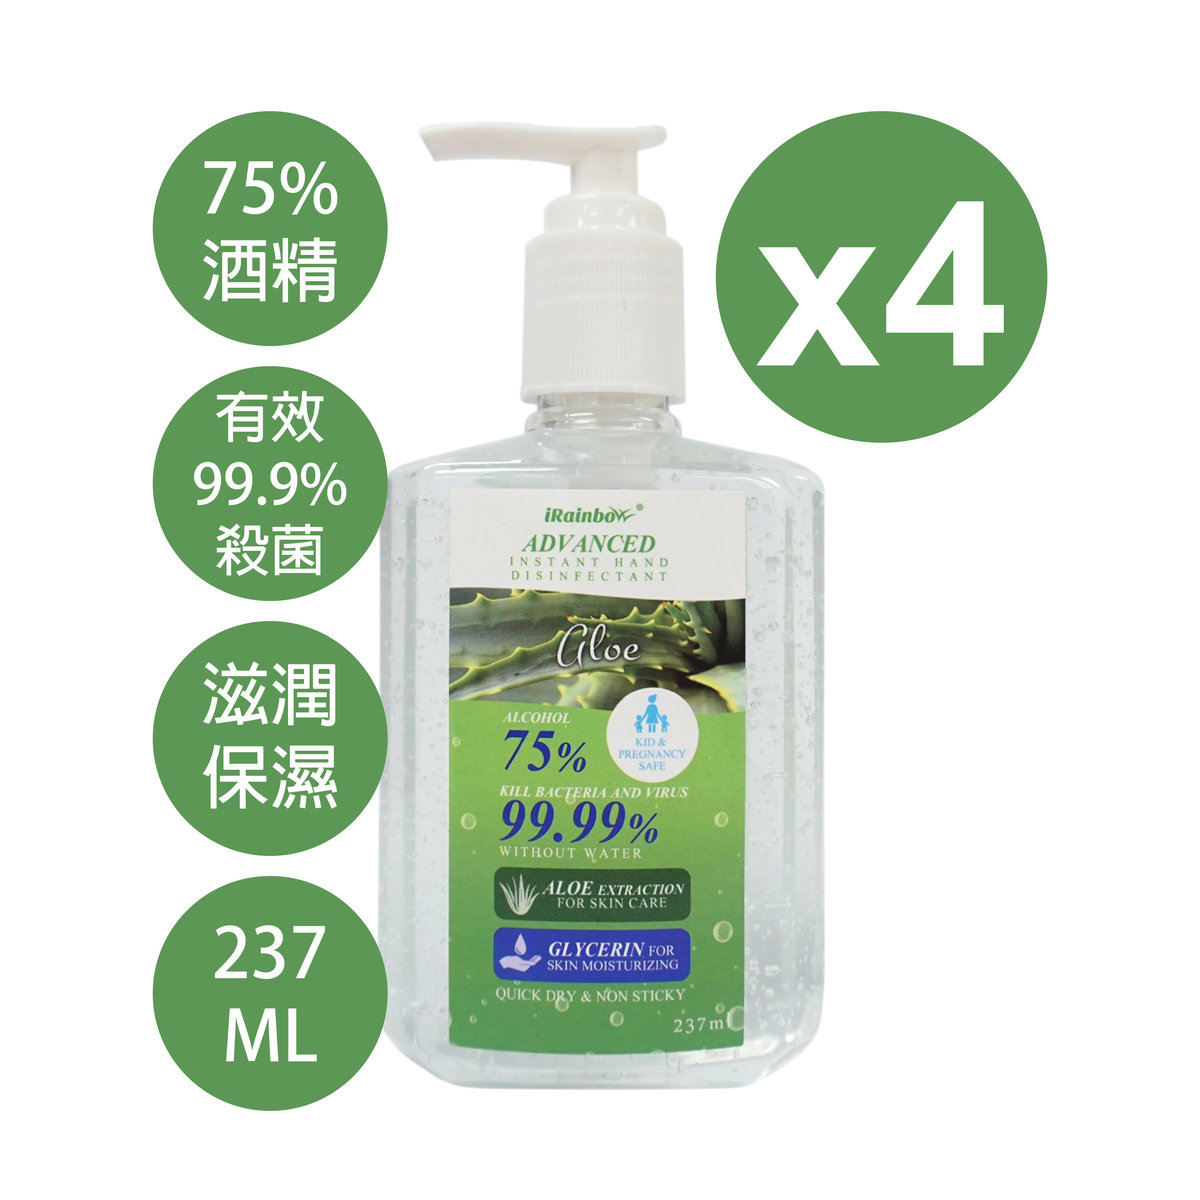 75%Alcohol instant Hand disinfectant - Aloe (237ml x 4 bottles)